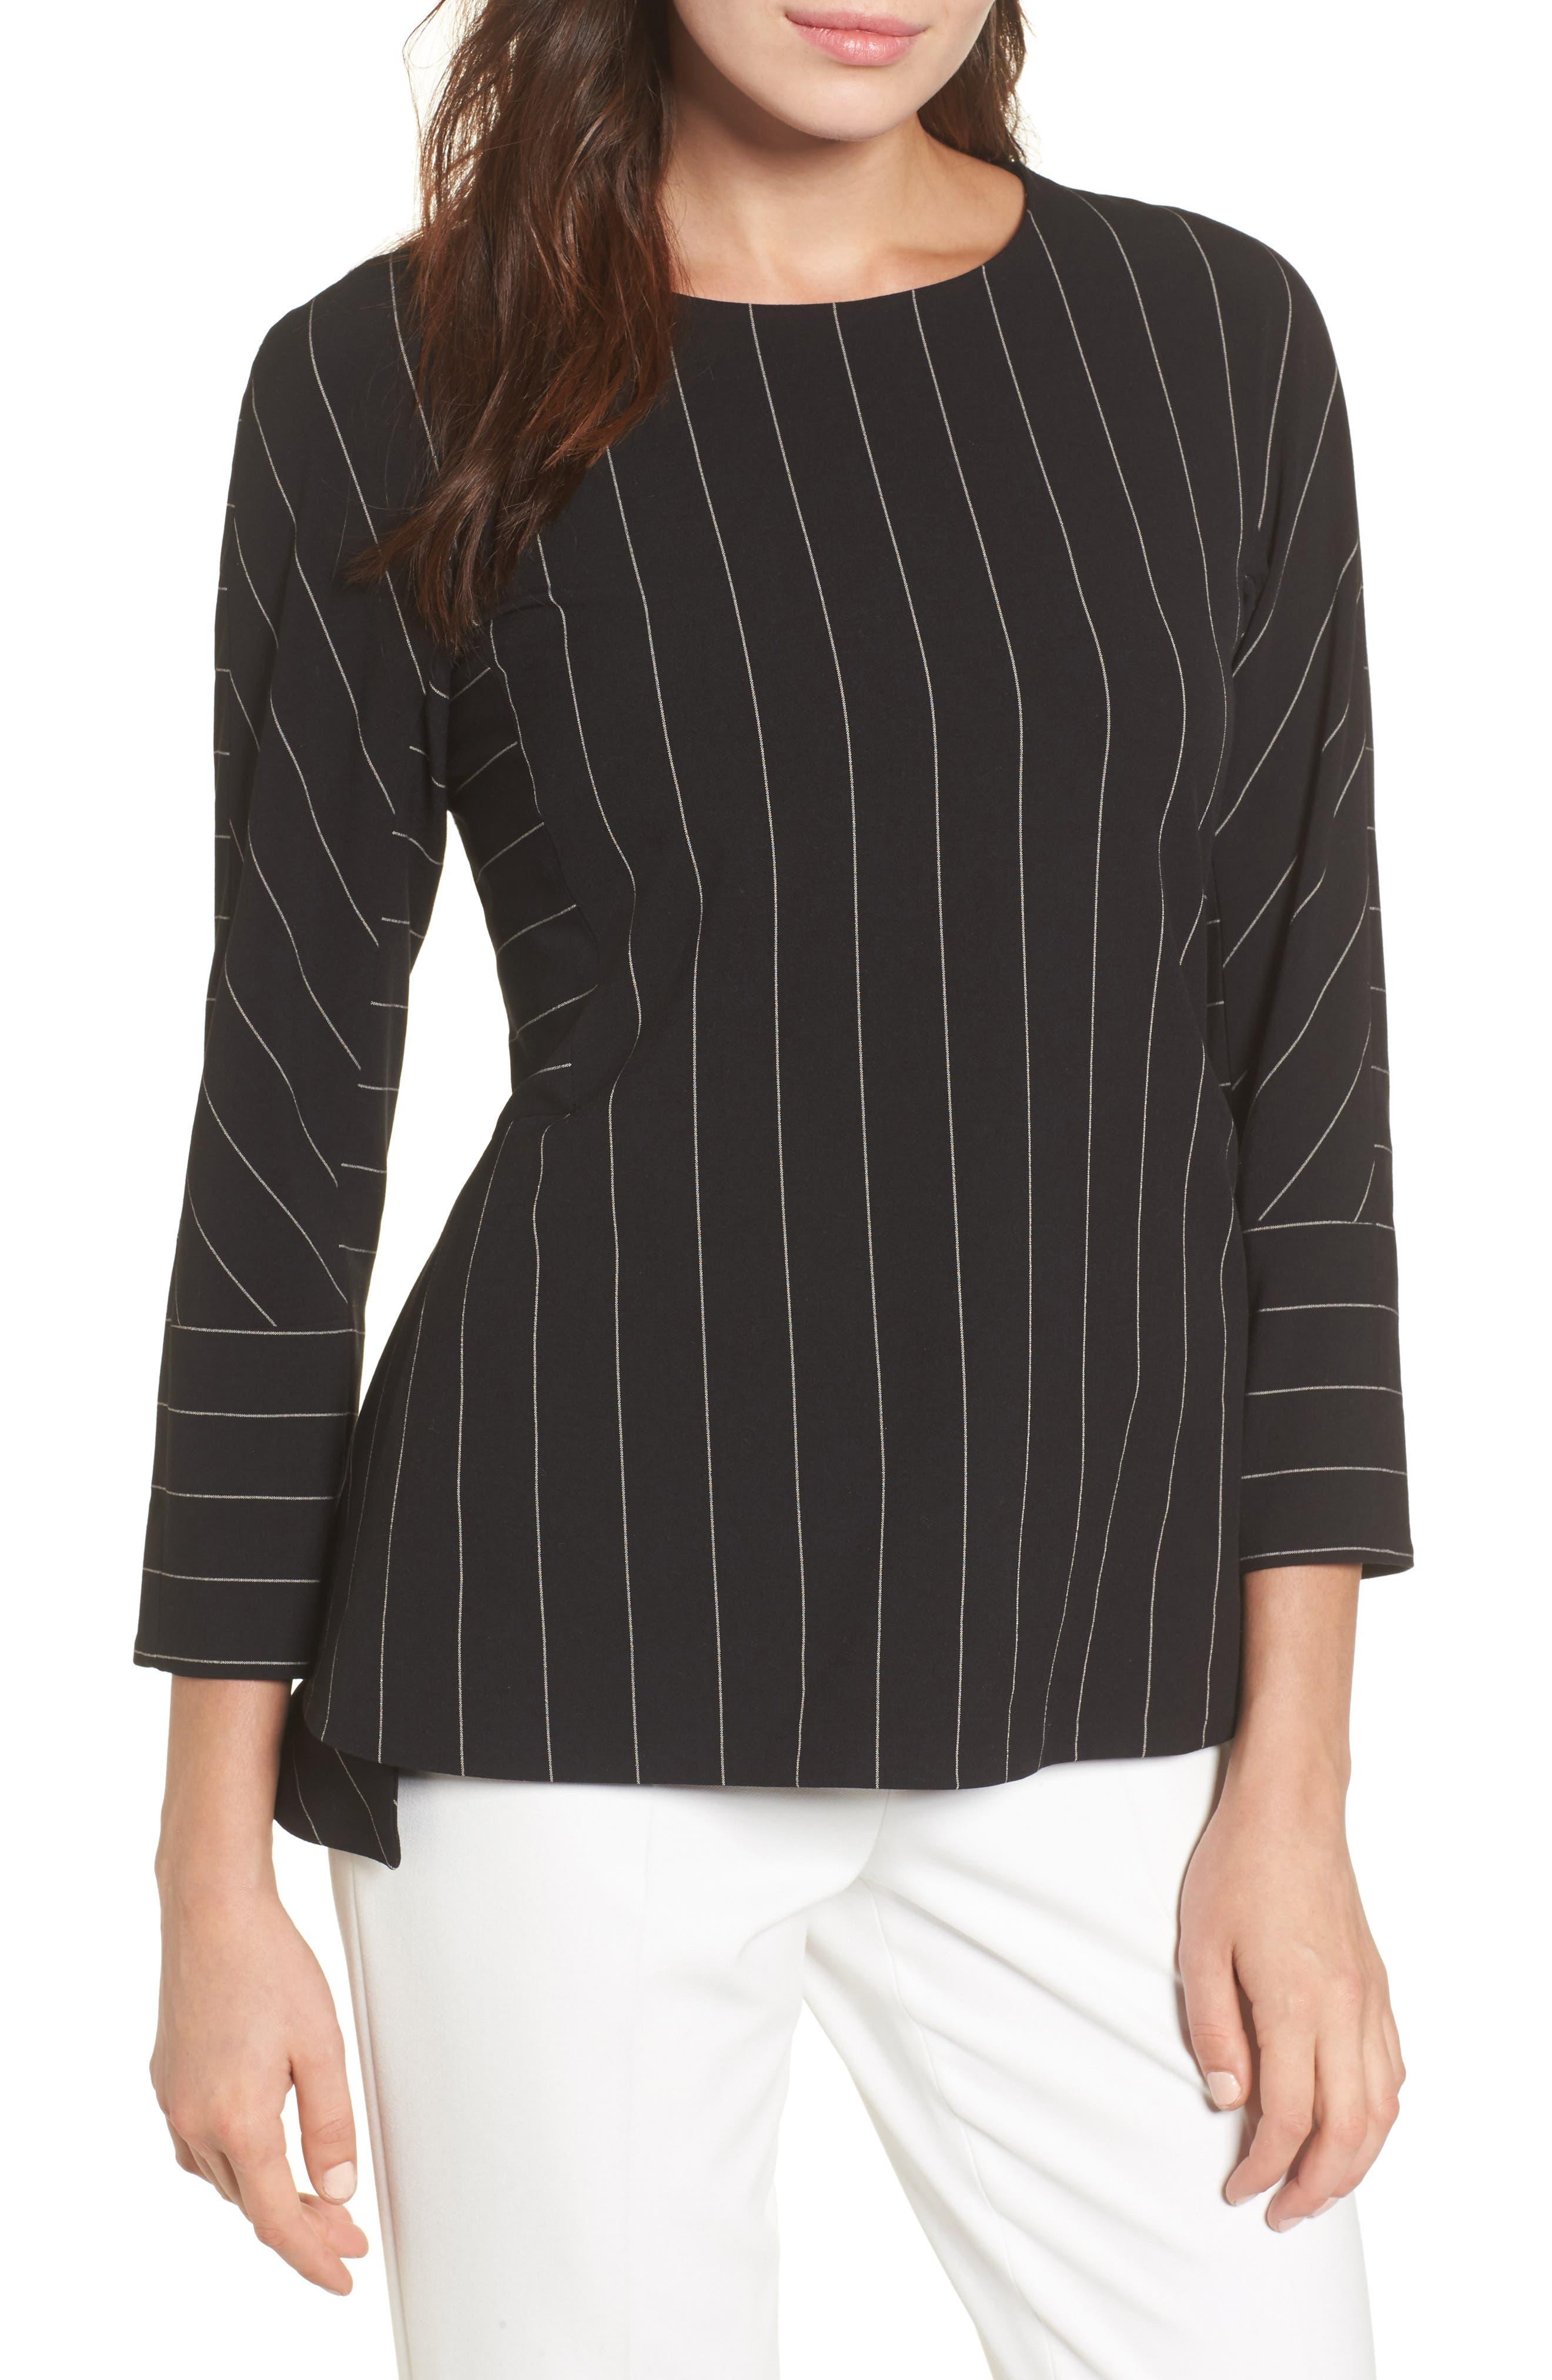 Pinstripe Blouse,                         Main,                         color, Black/ White